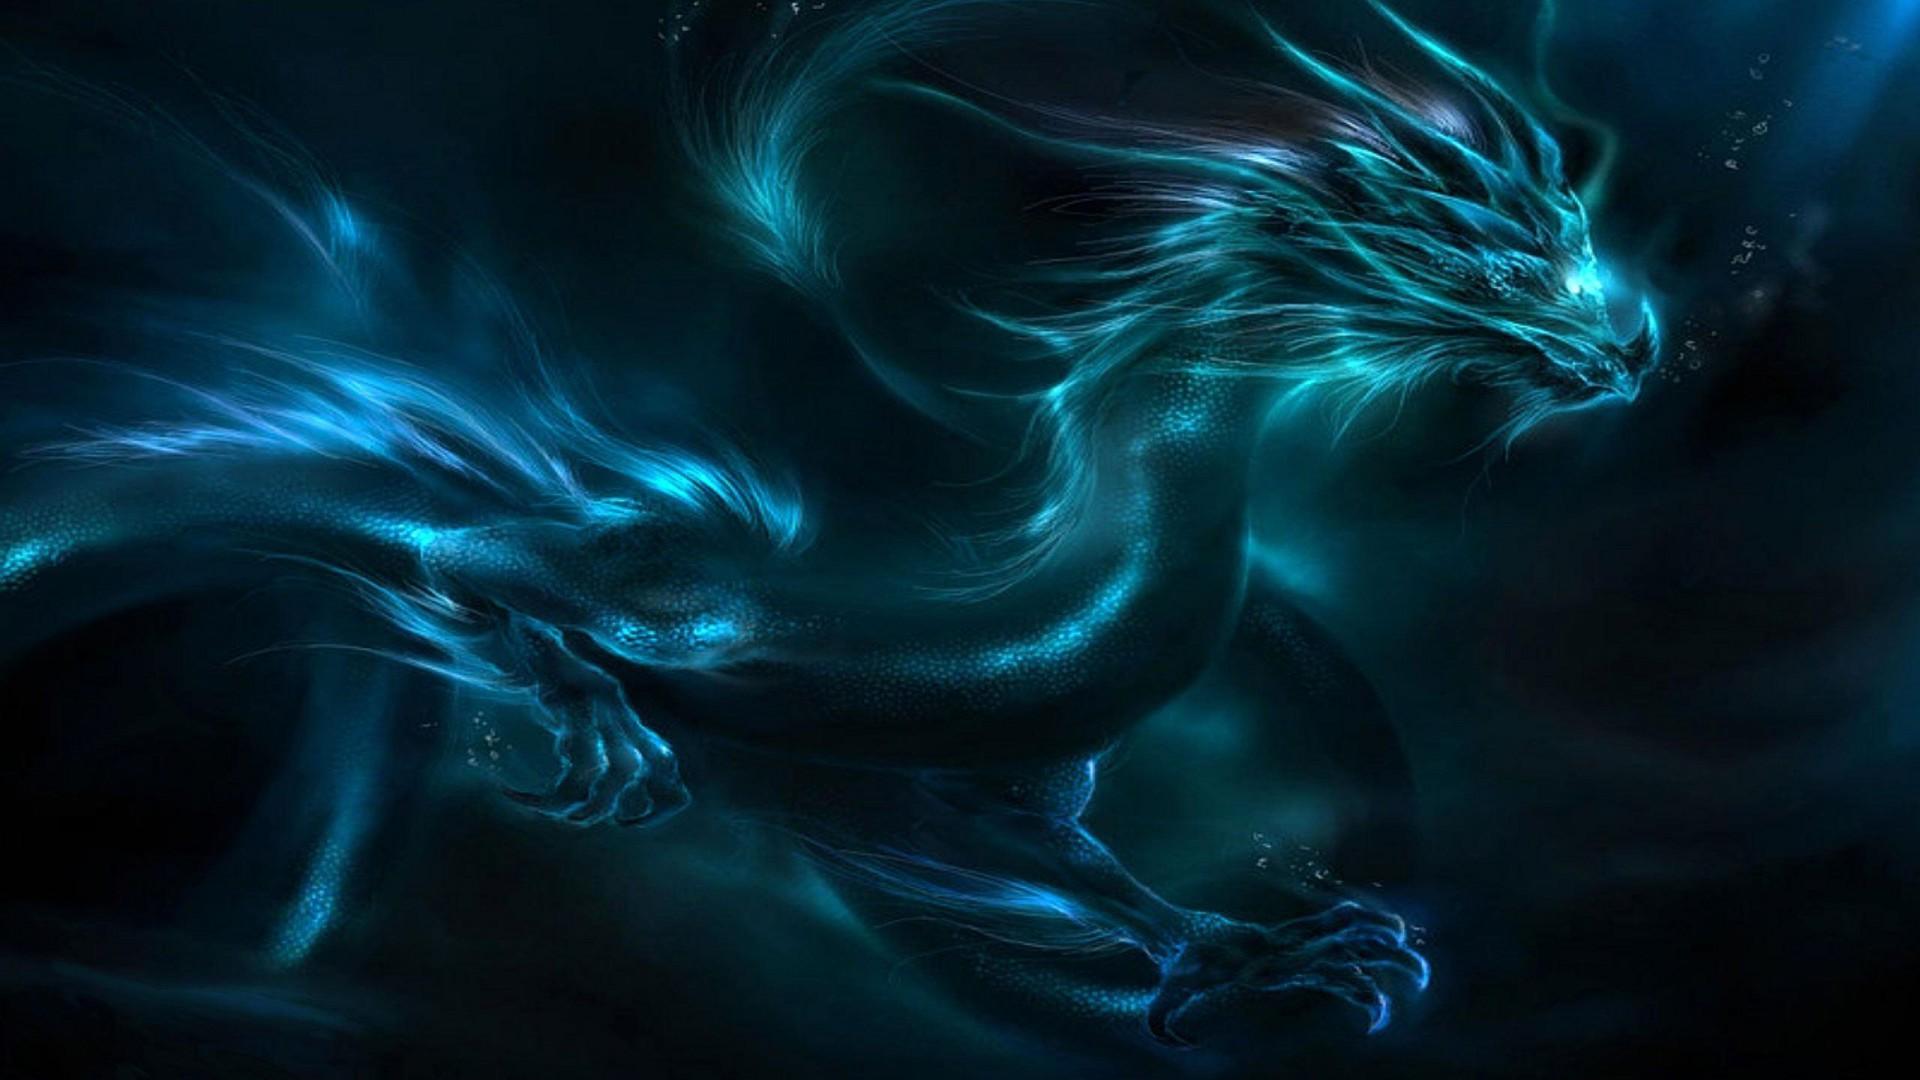 Blue Lightning Dragon Wallpaper HD Wallpaper Area HD 1920x1080